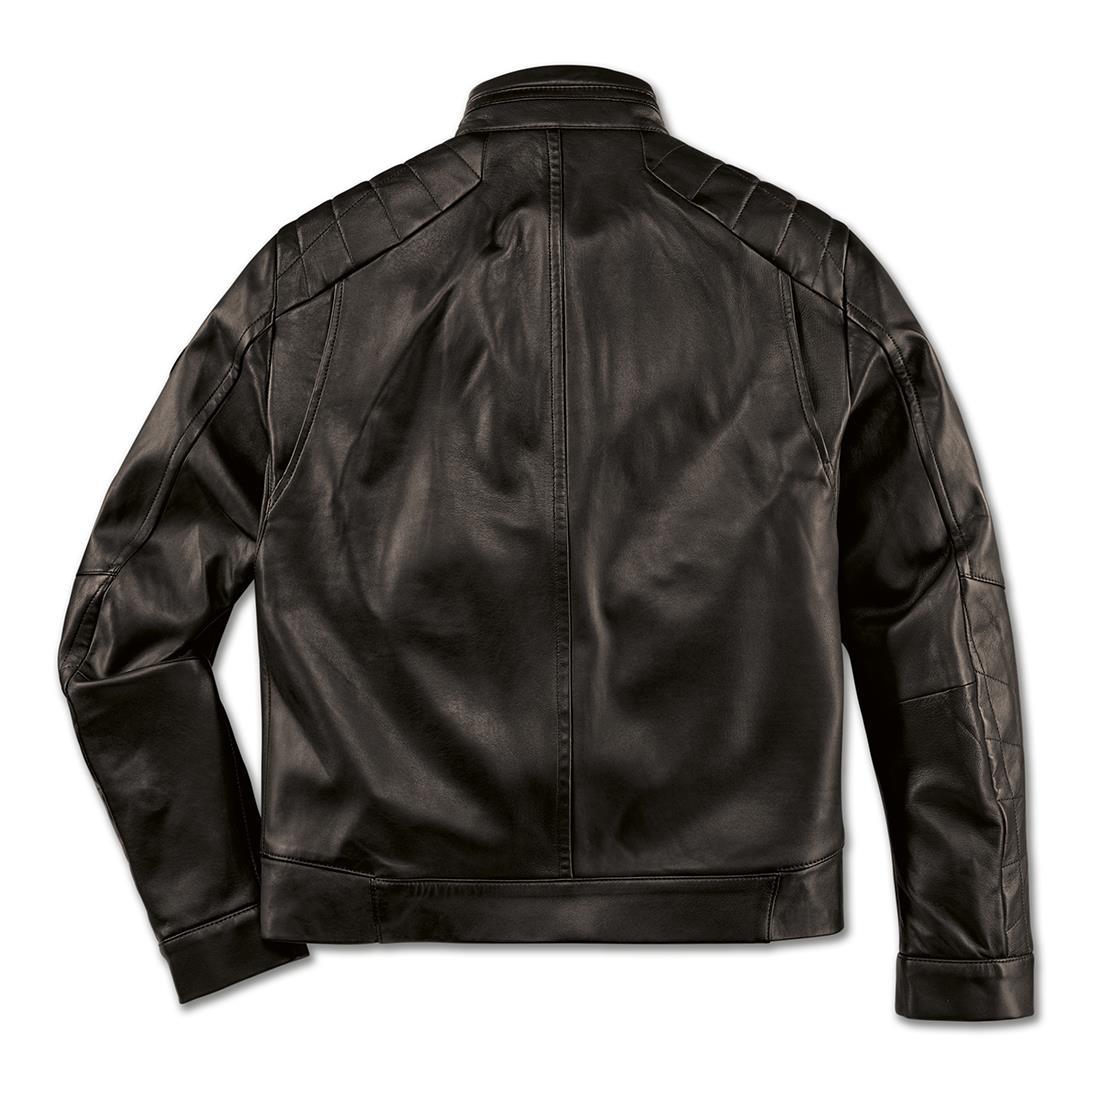 BMW Men's Leather Jacket